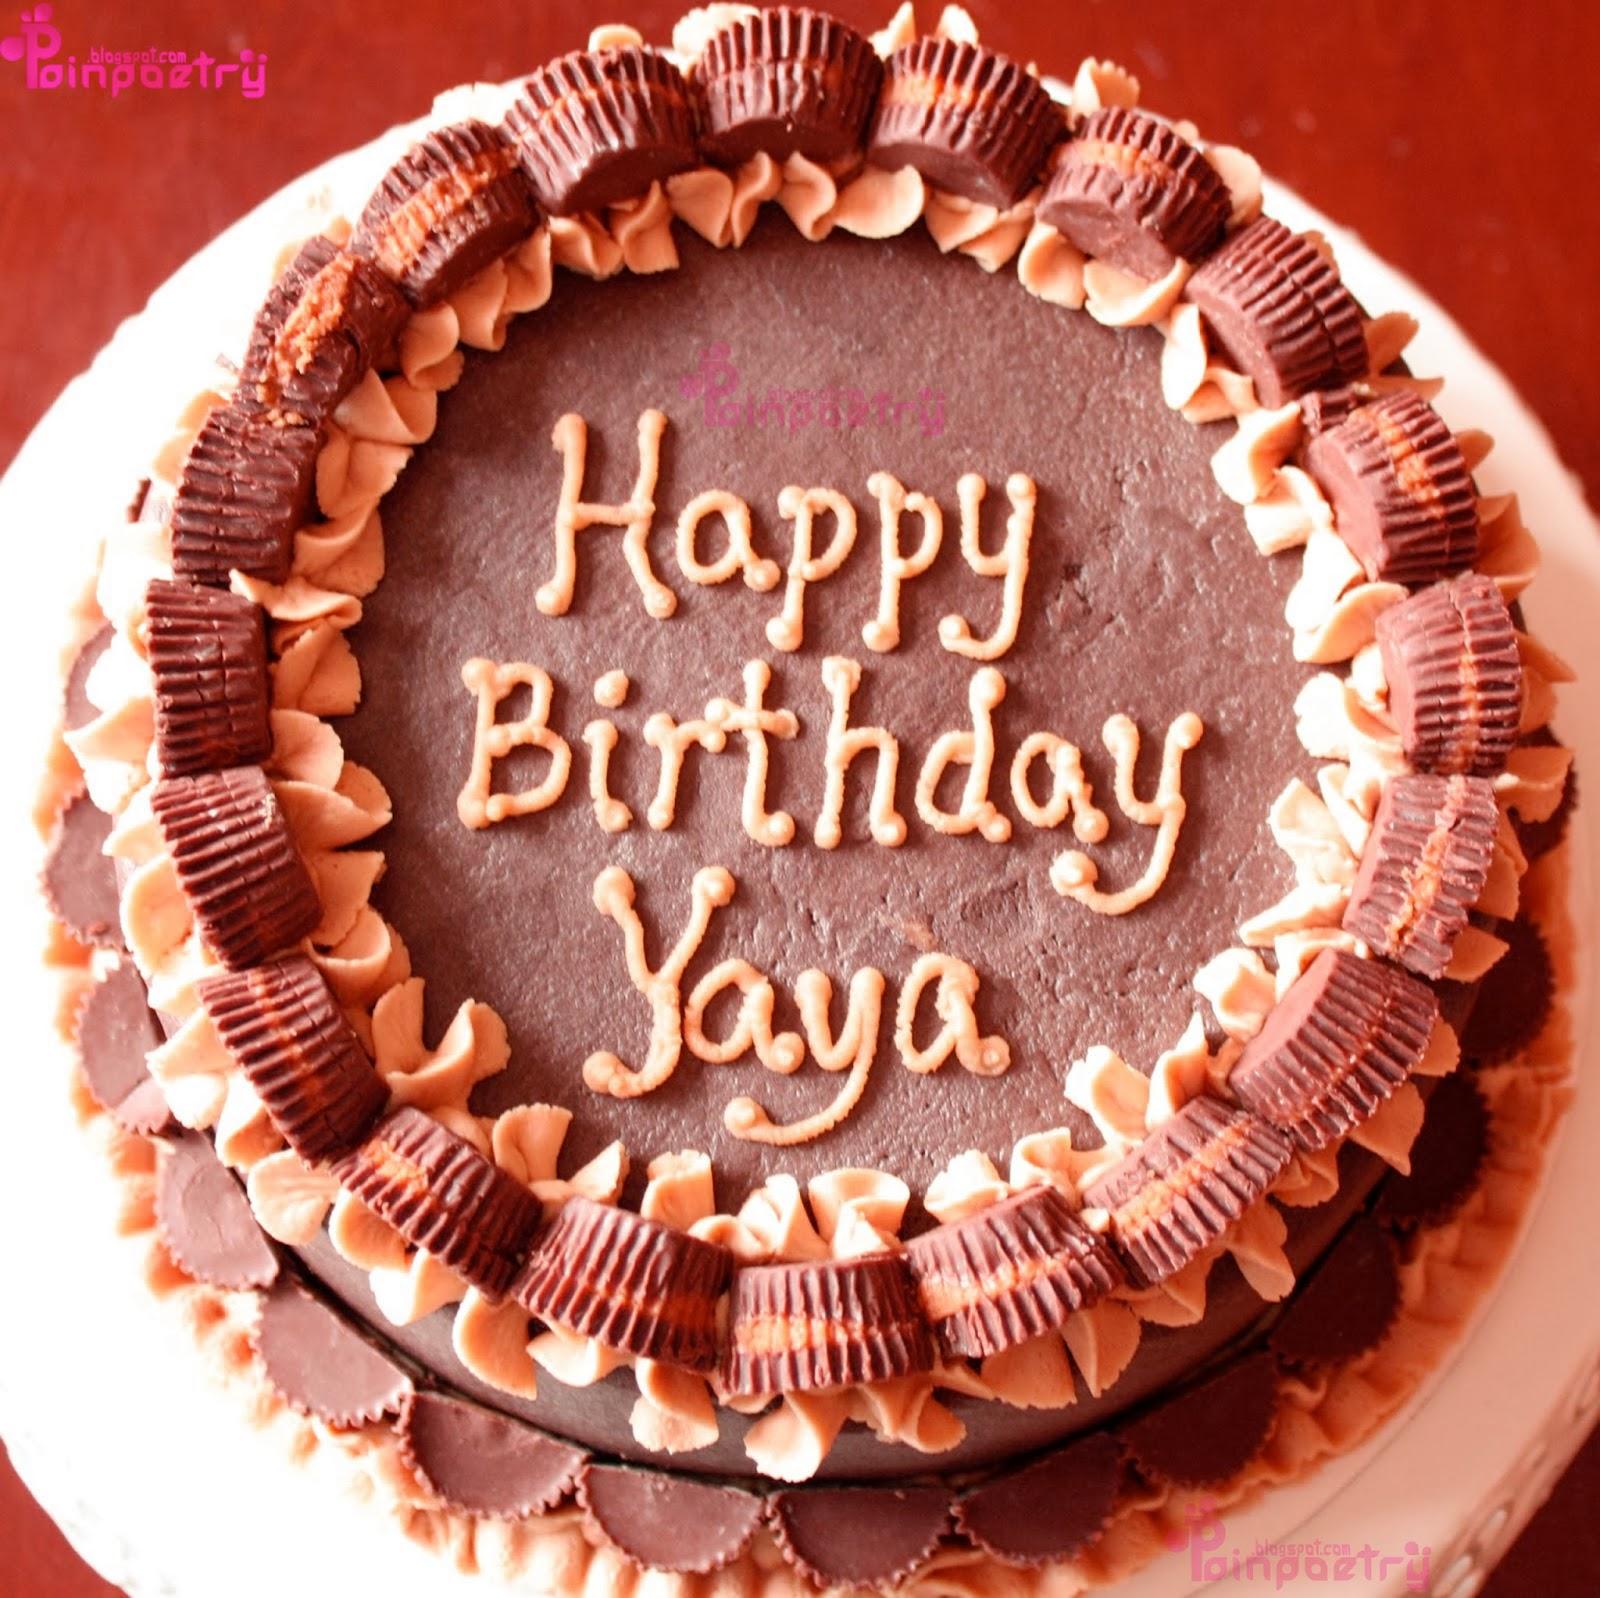 Happy-Birthday-Cake-Image-HD